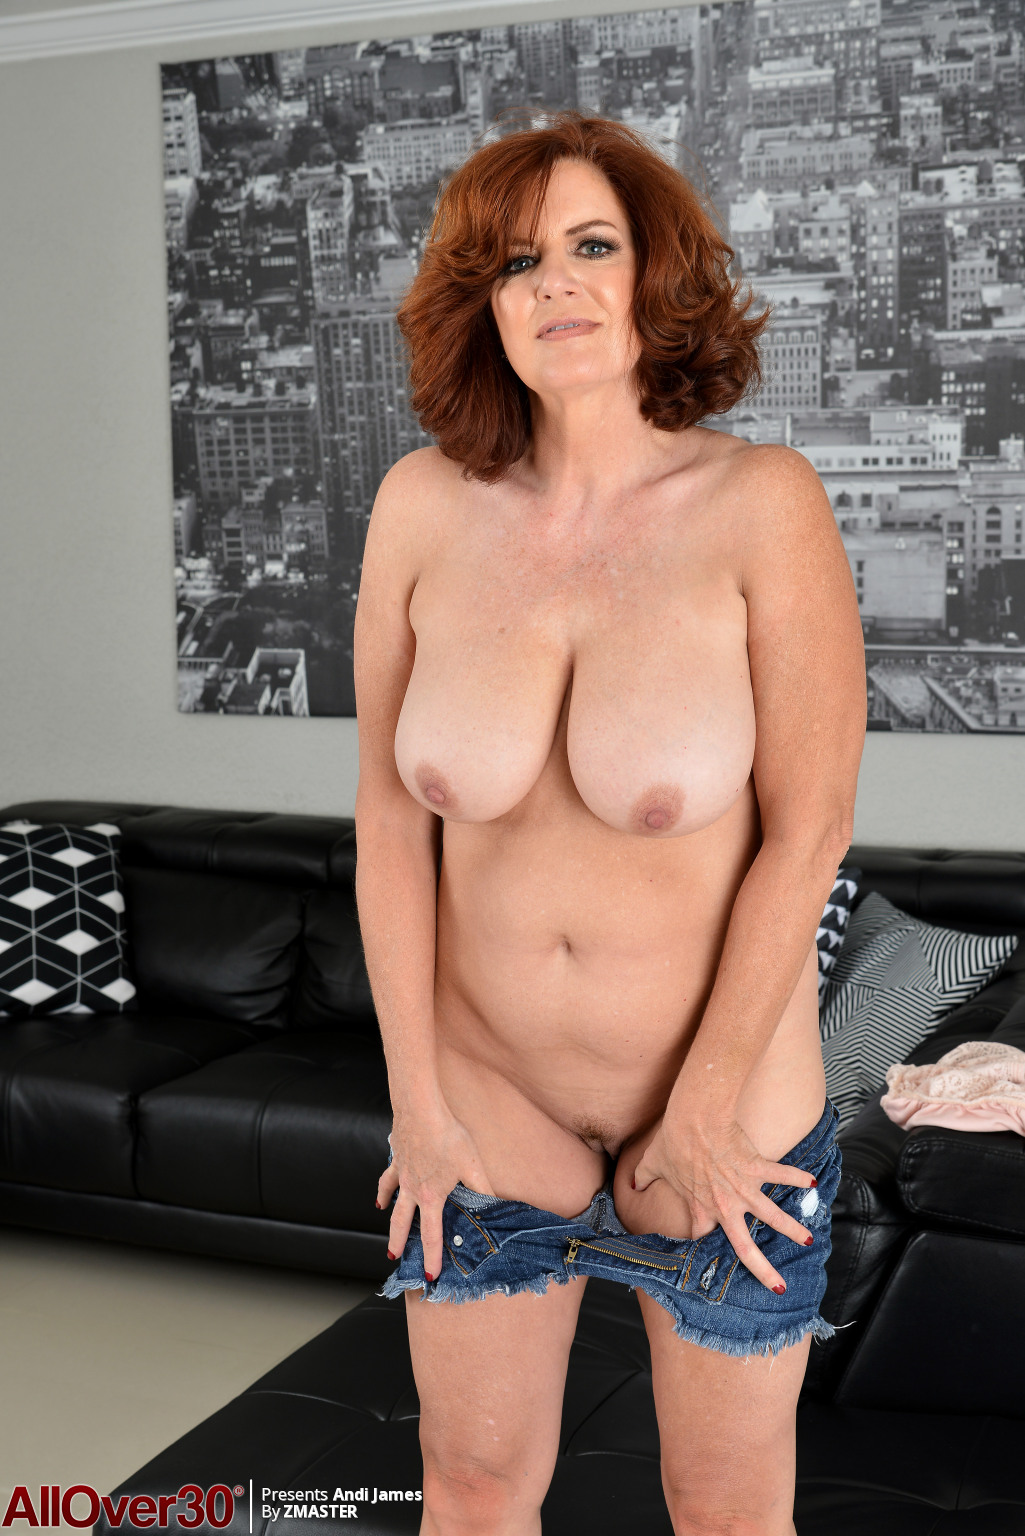 Battlestar galactia women nude